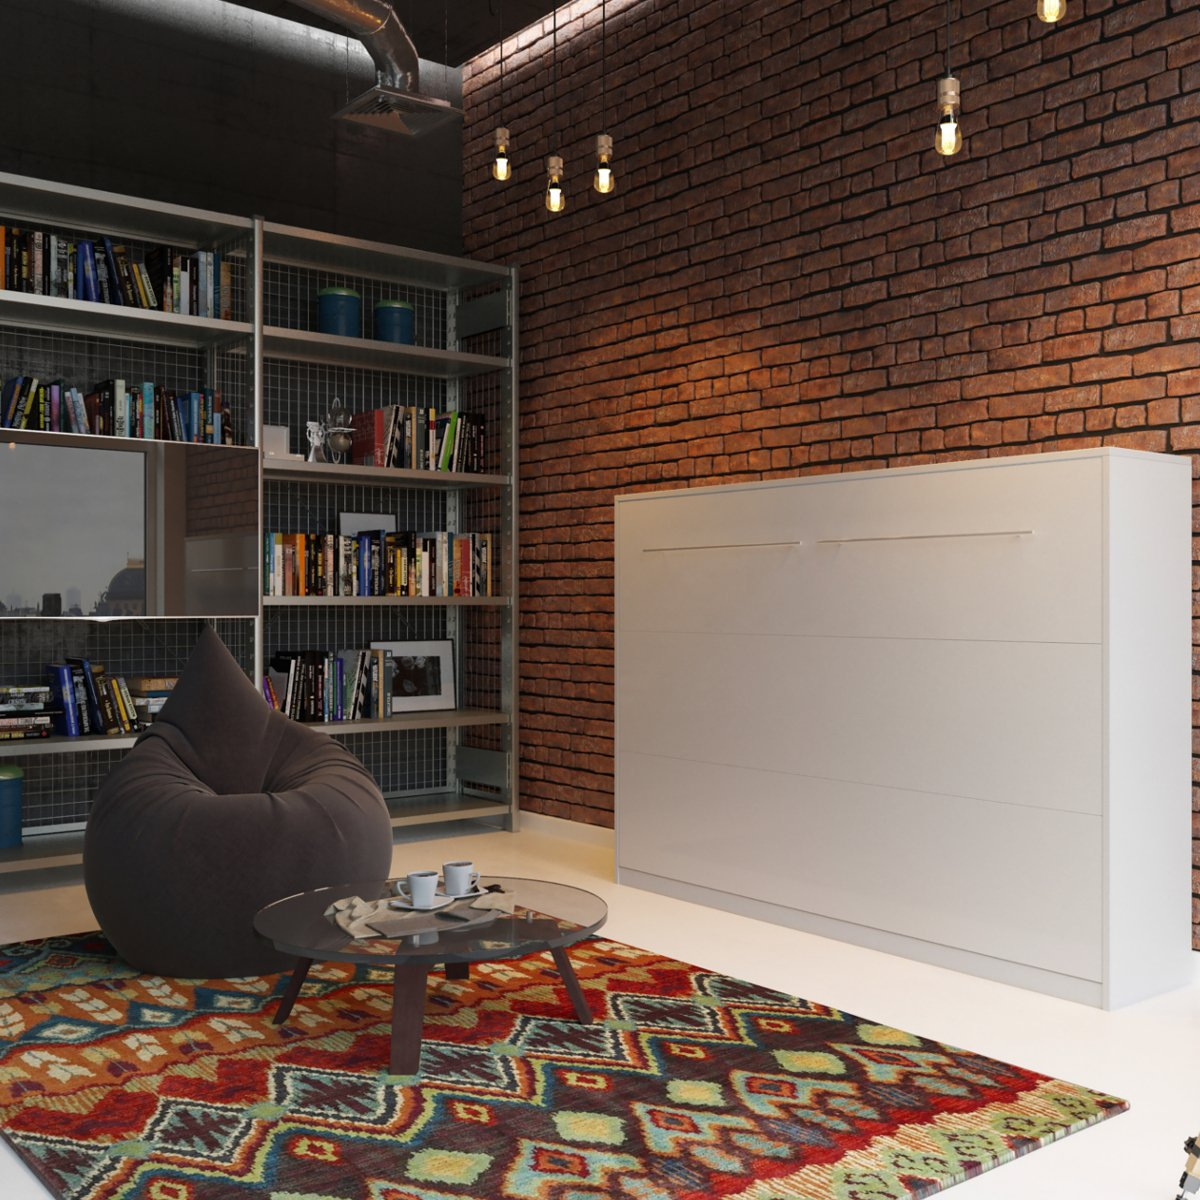 Schrankbett 140×200 weiss, ideal als Gästebett – Wandbett, Schrank mit integriertem Klappbett, SMARTBett günstig